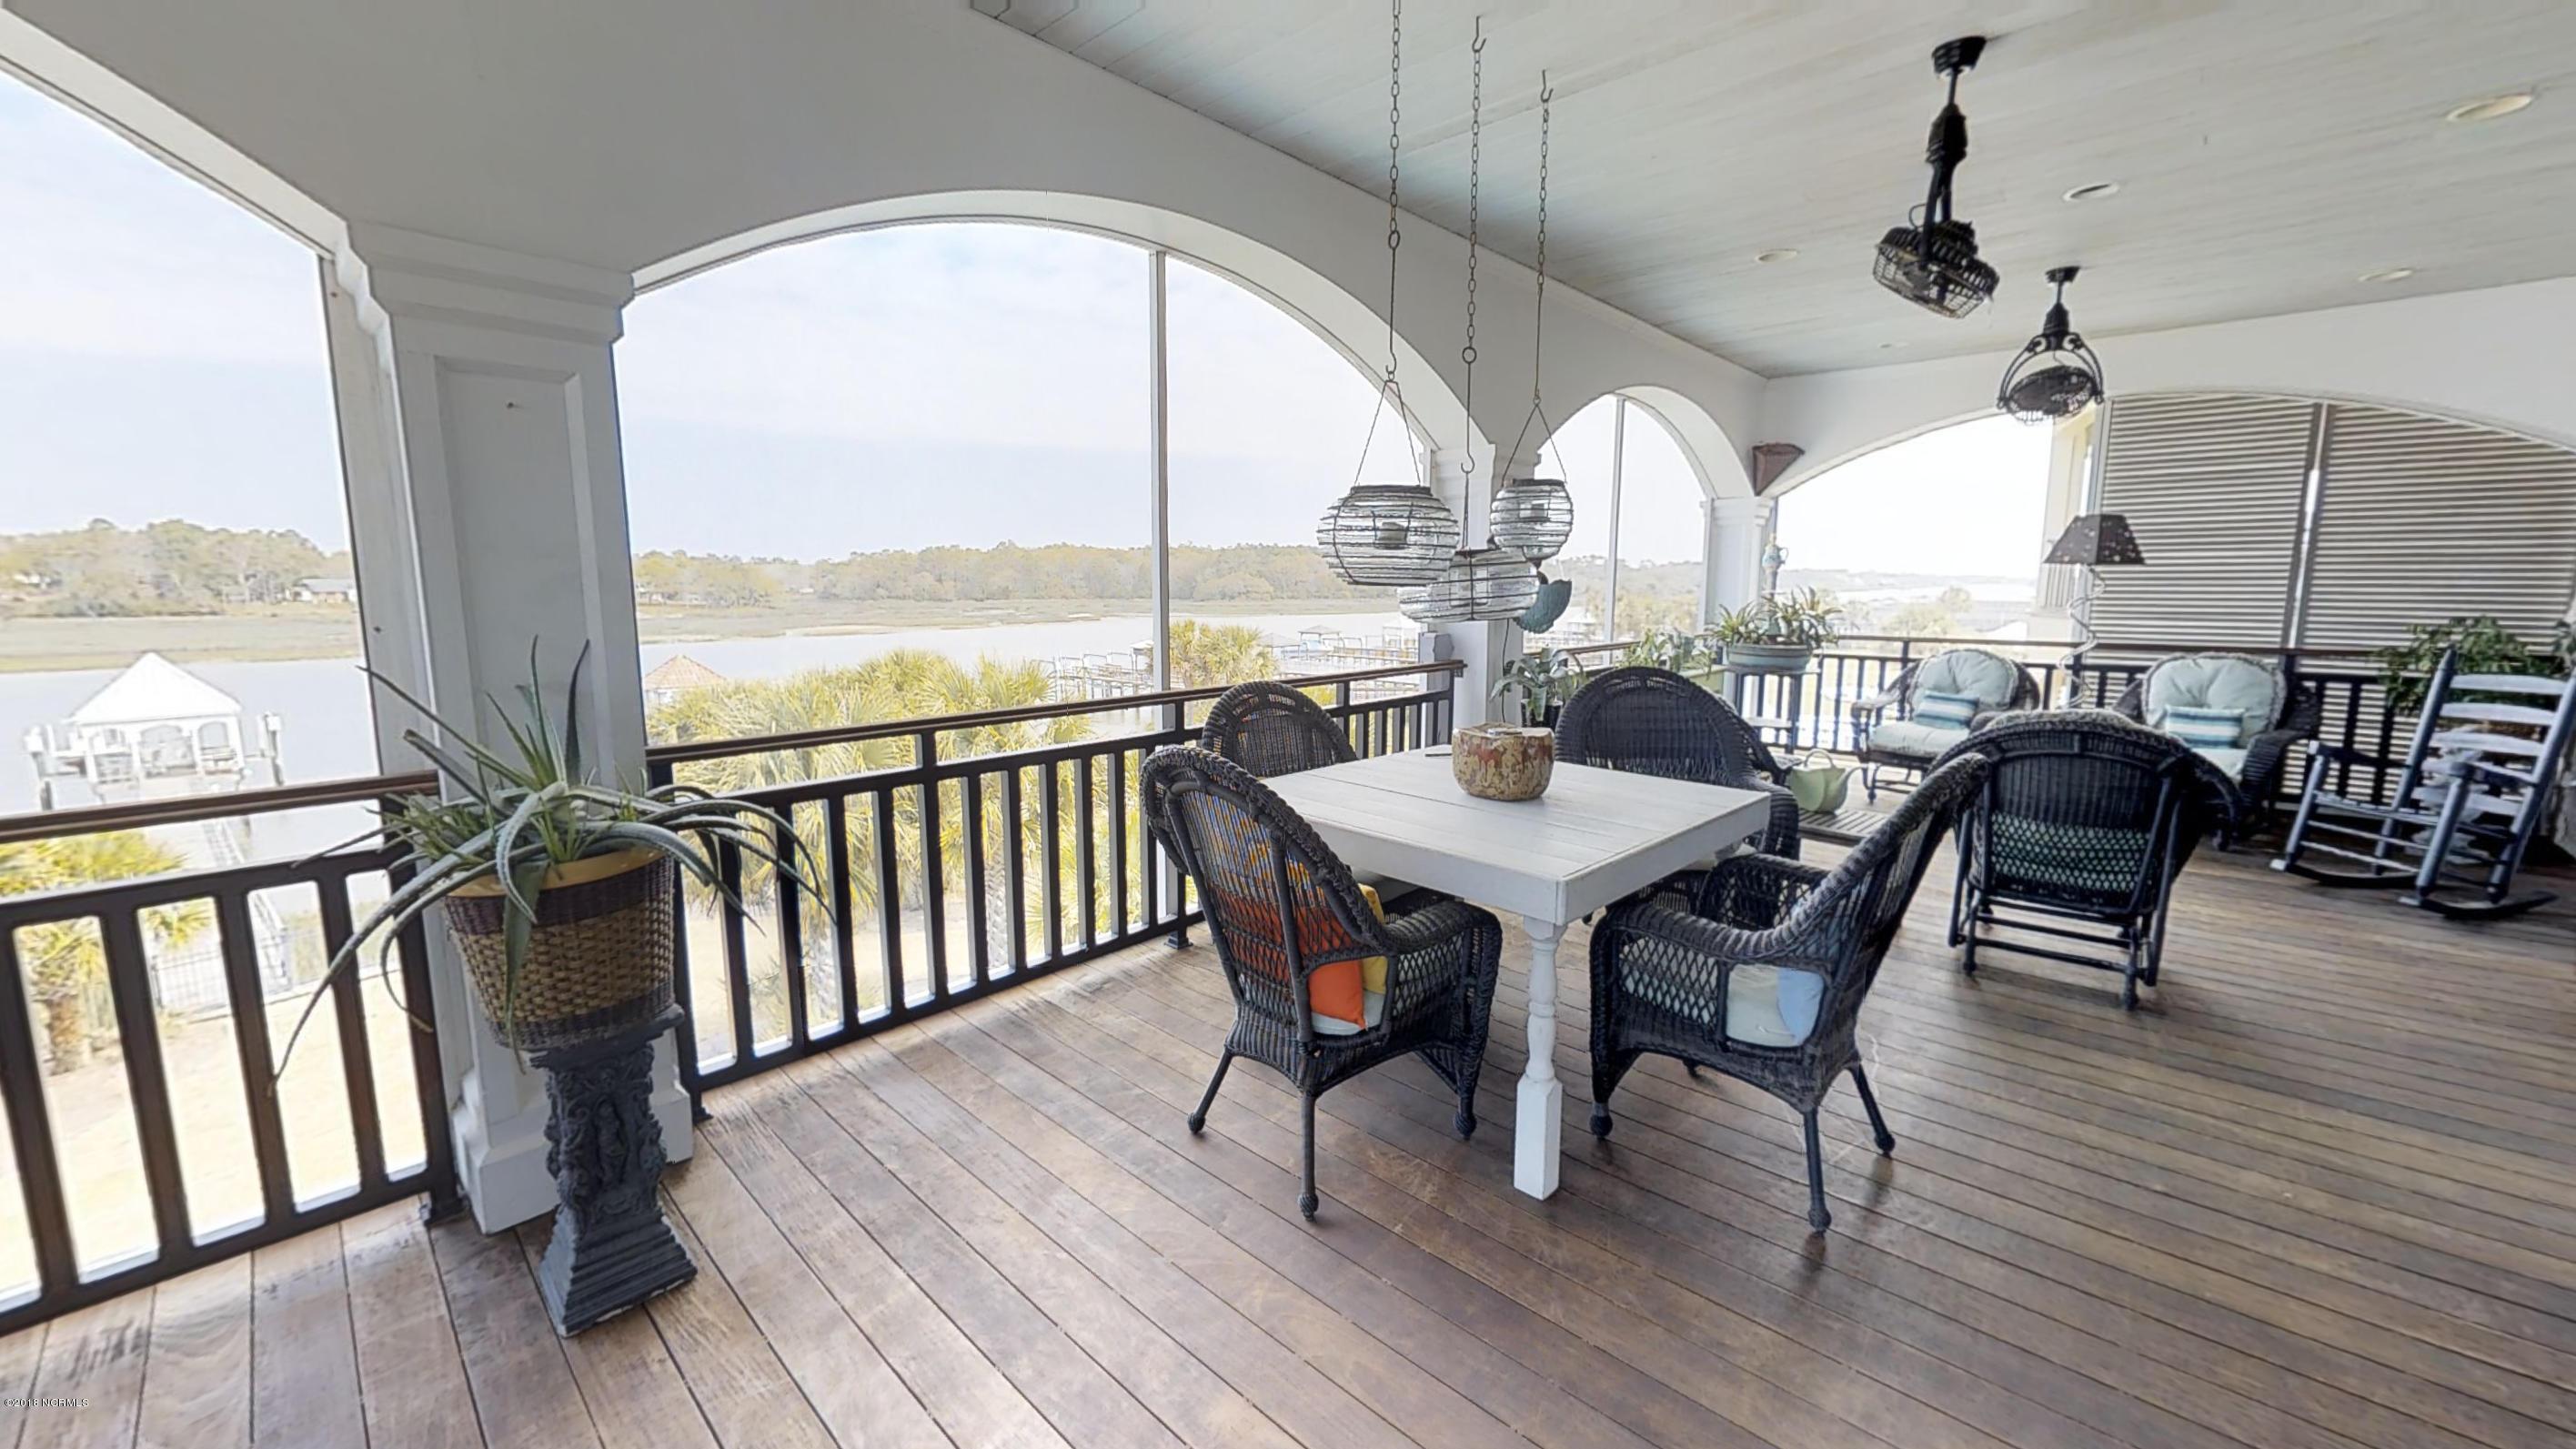 Ocean Isle Beach Real Estate - http://cdn.resize.sparkplatform.com/ncr/1024x768/true/20180414120139828048000000-o.jpg